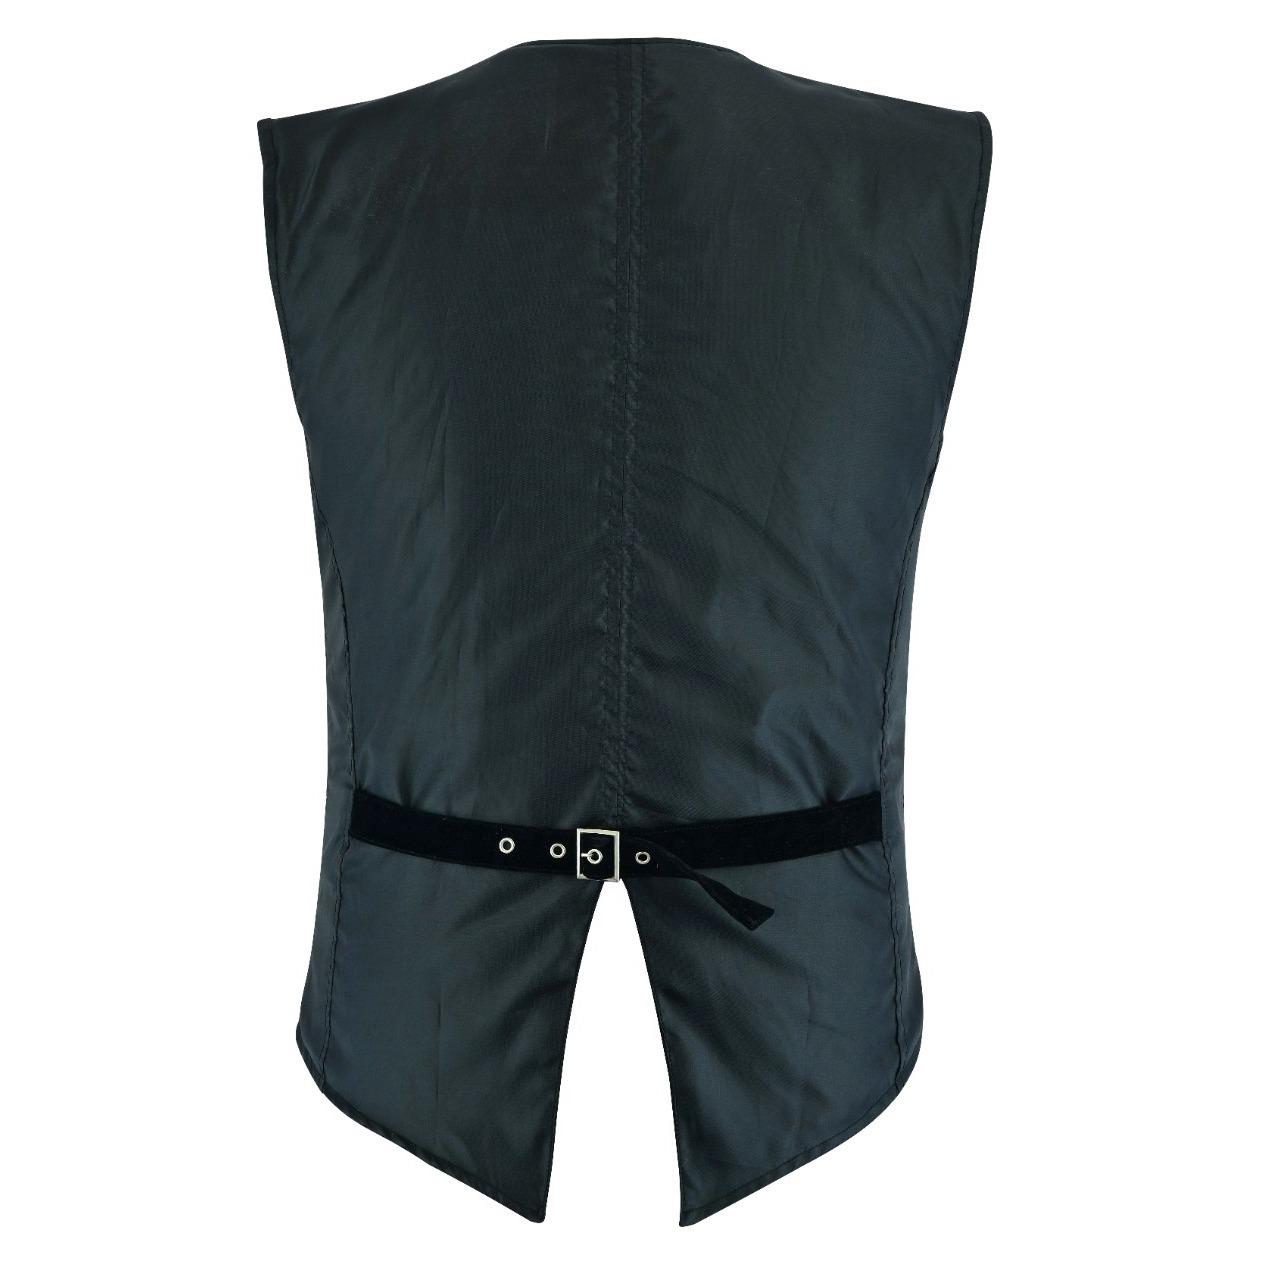 DARKROCK Men's Brocade Vest Waistcoat Black Damask Velvet Gothic Steampunk Renaissance (2)